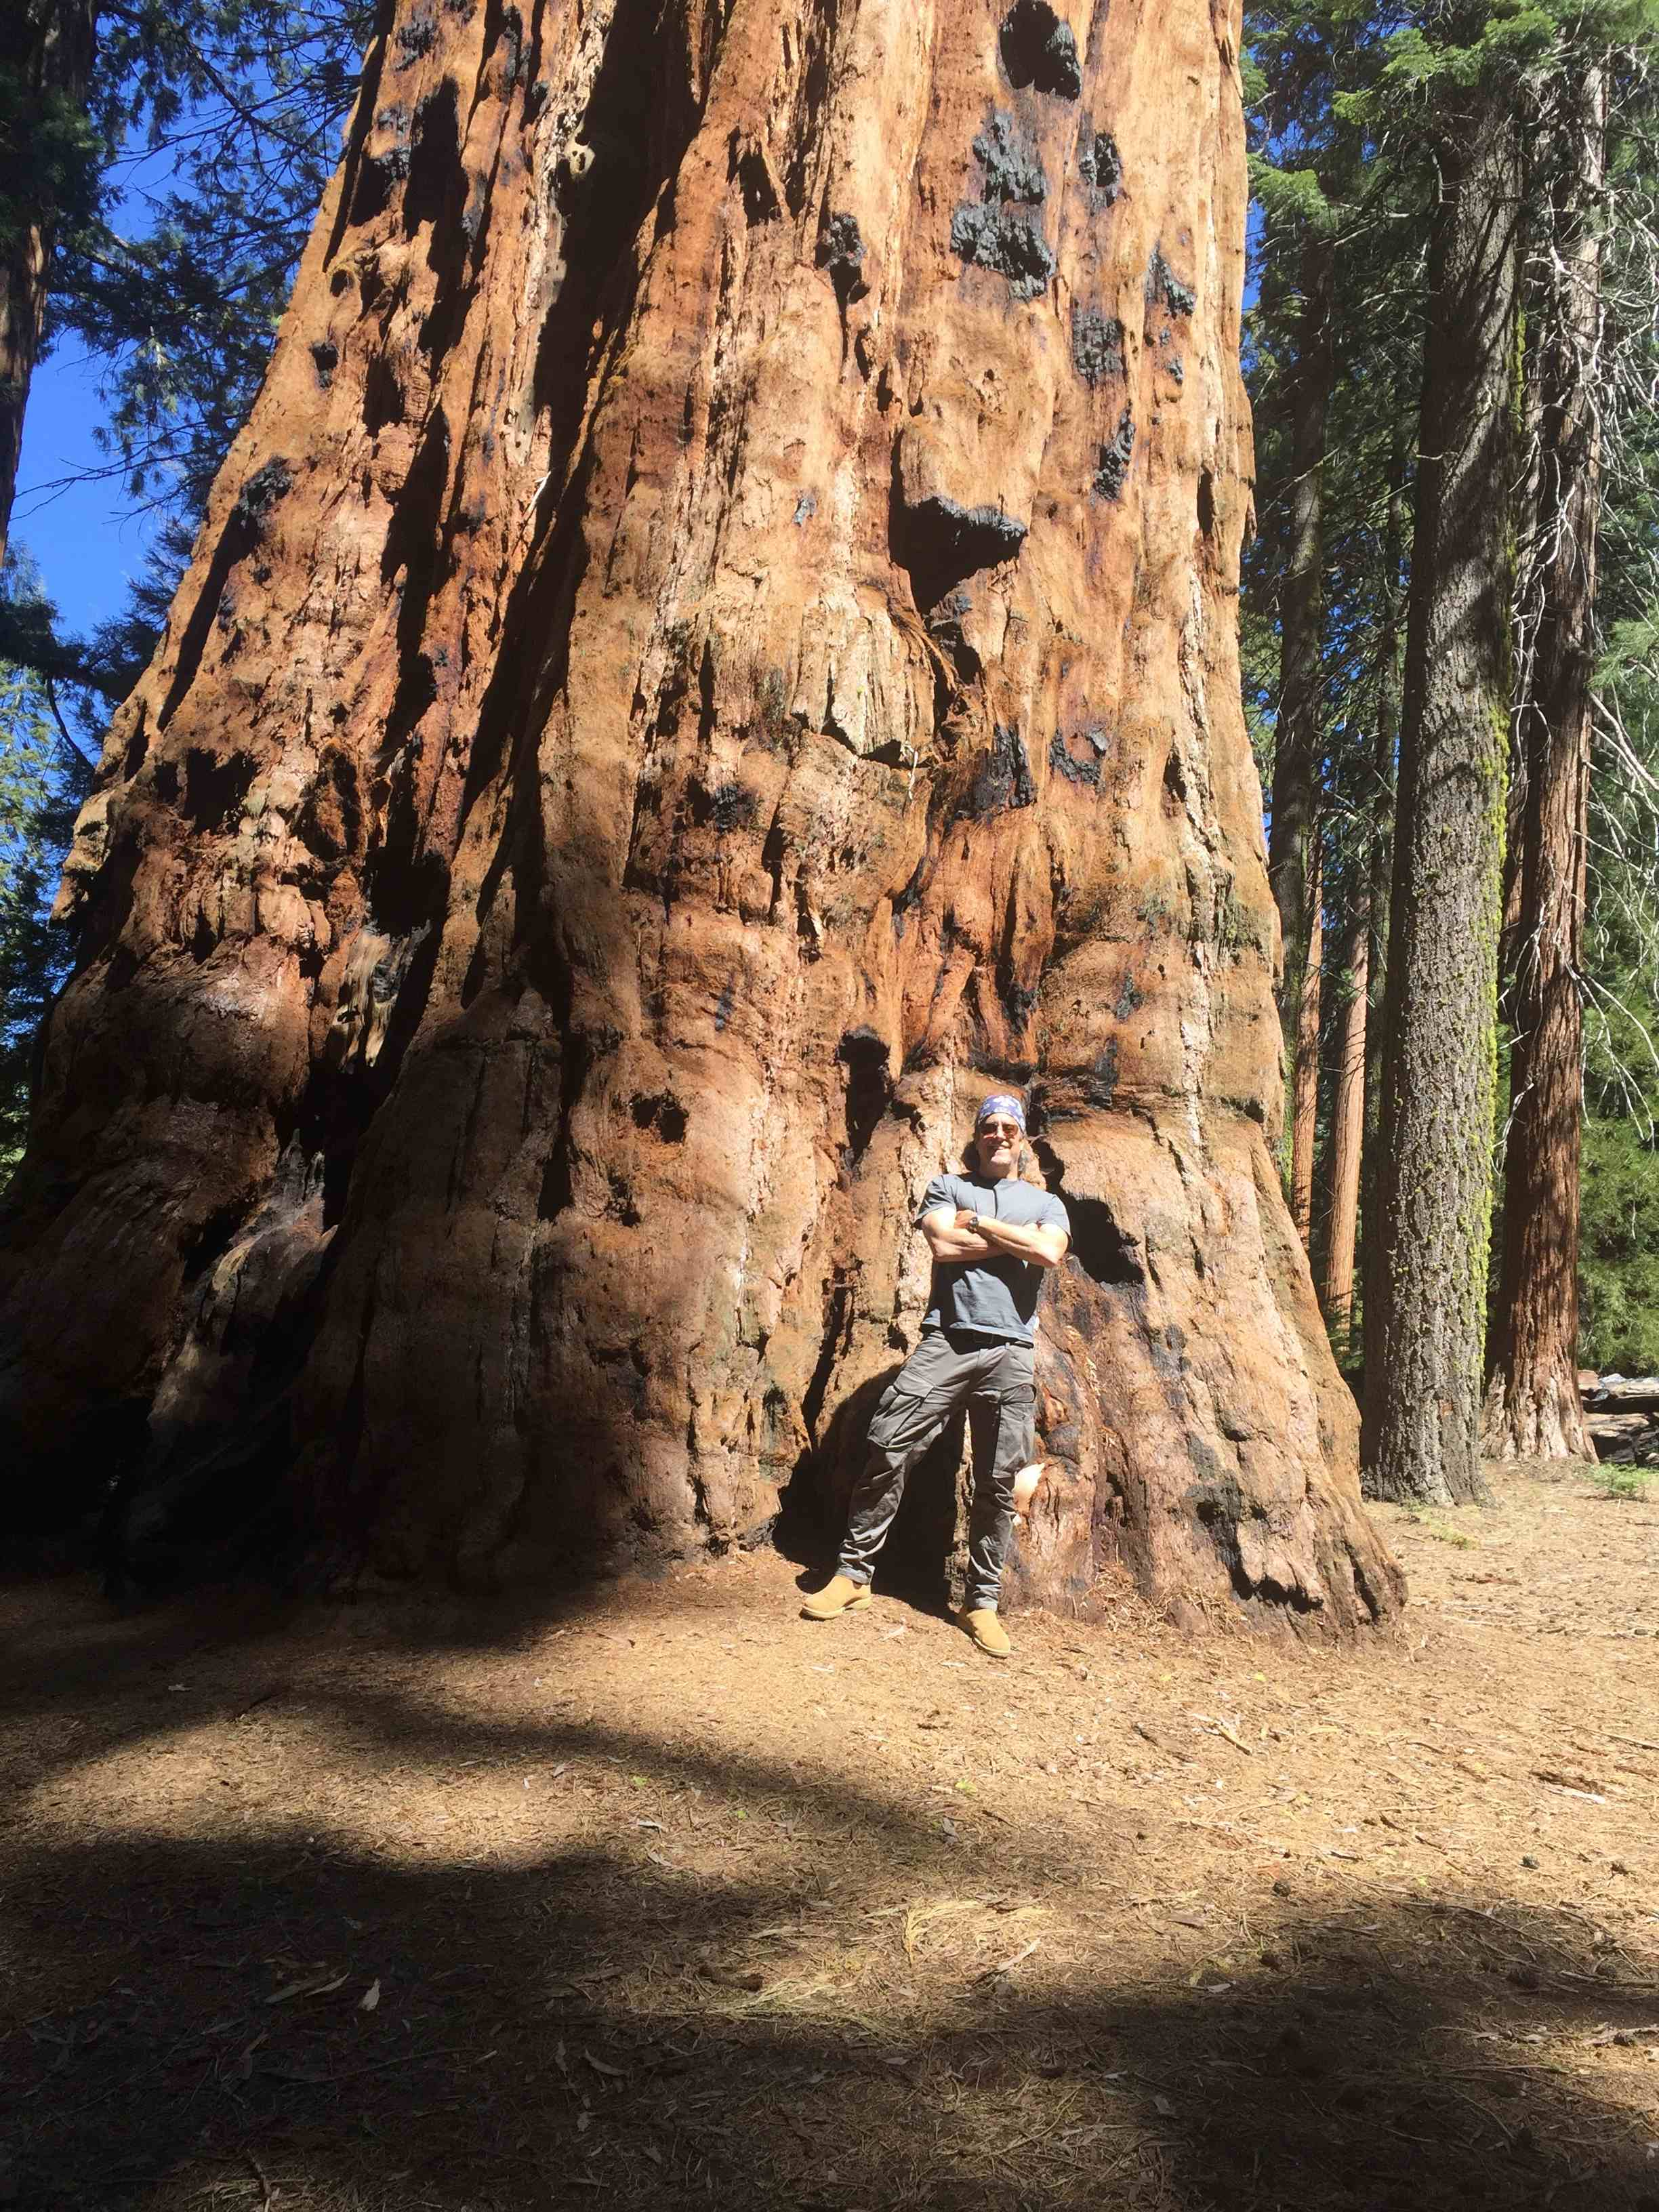 An exquisite Ancient One:  Sequoiadendron giganteum